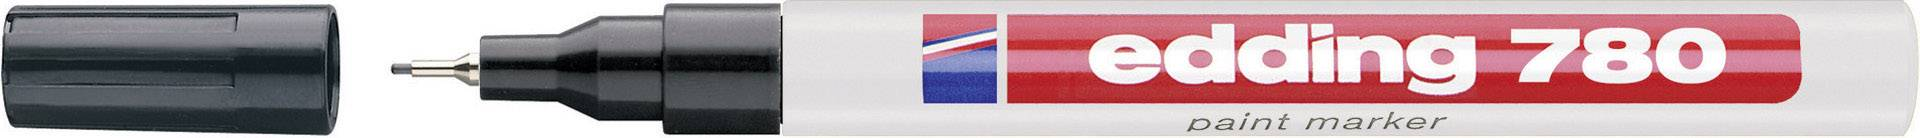 Paint Edding 4-780-1-1001 černá oblý 0.8 mm (max) 1 ks